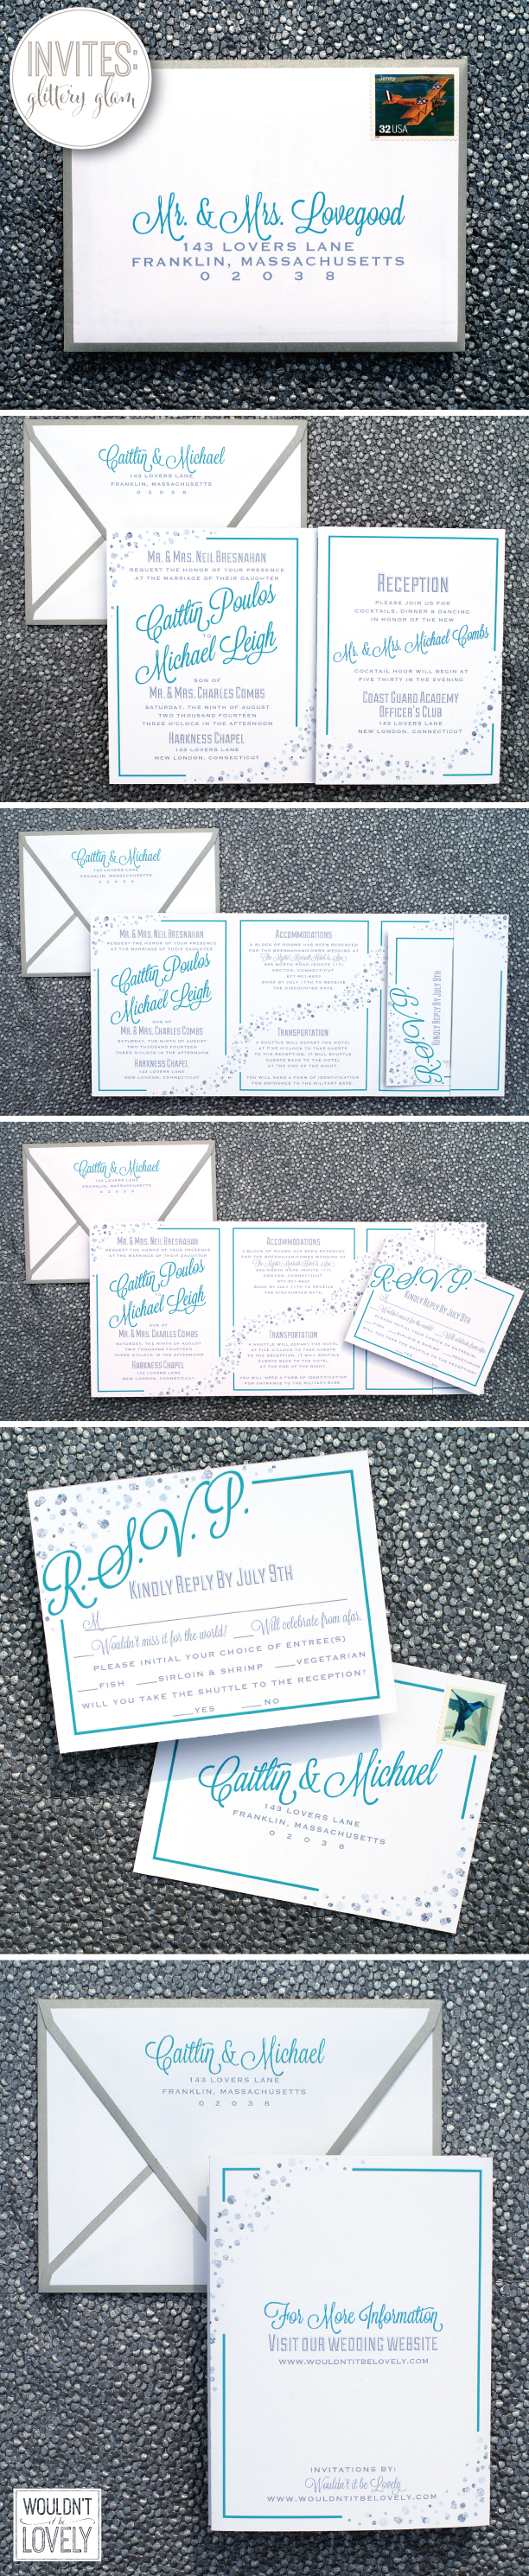 traditional and glam wedding invitation suite custom design